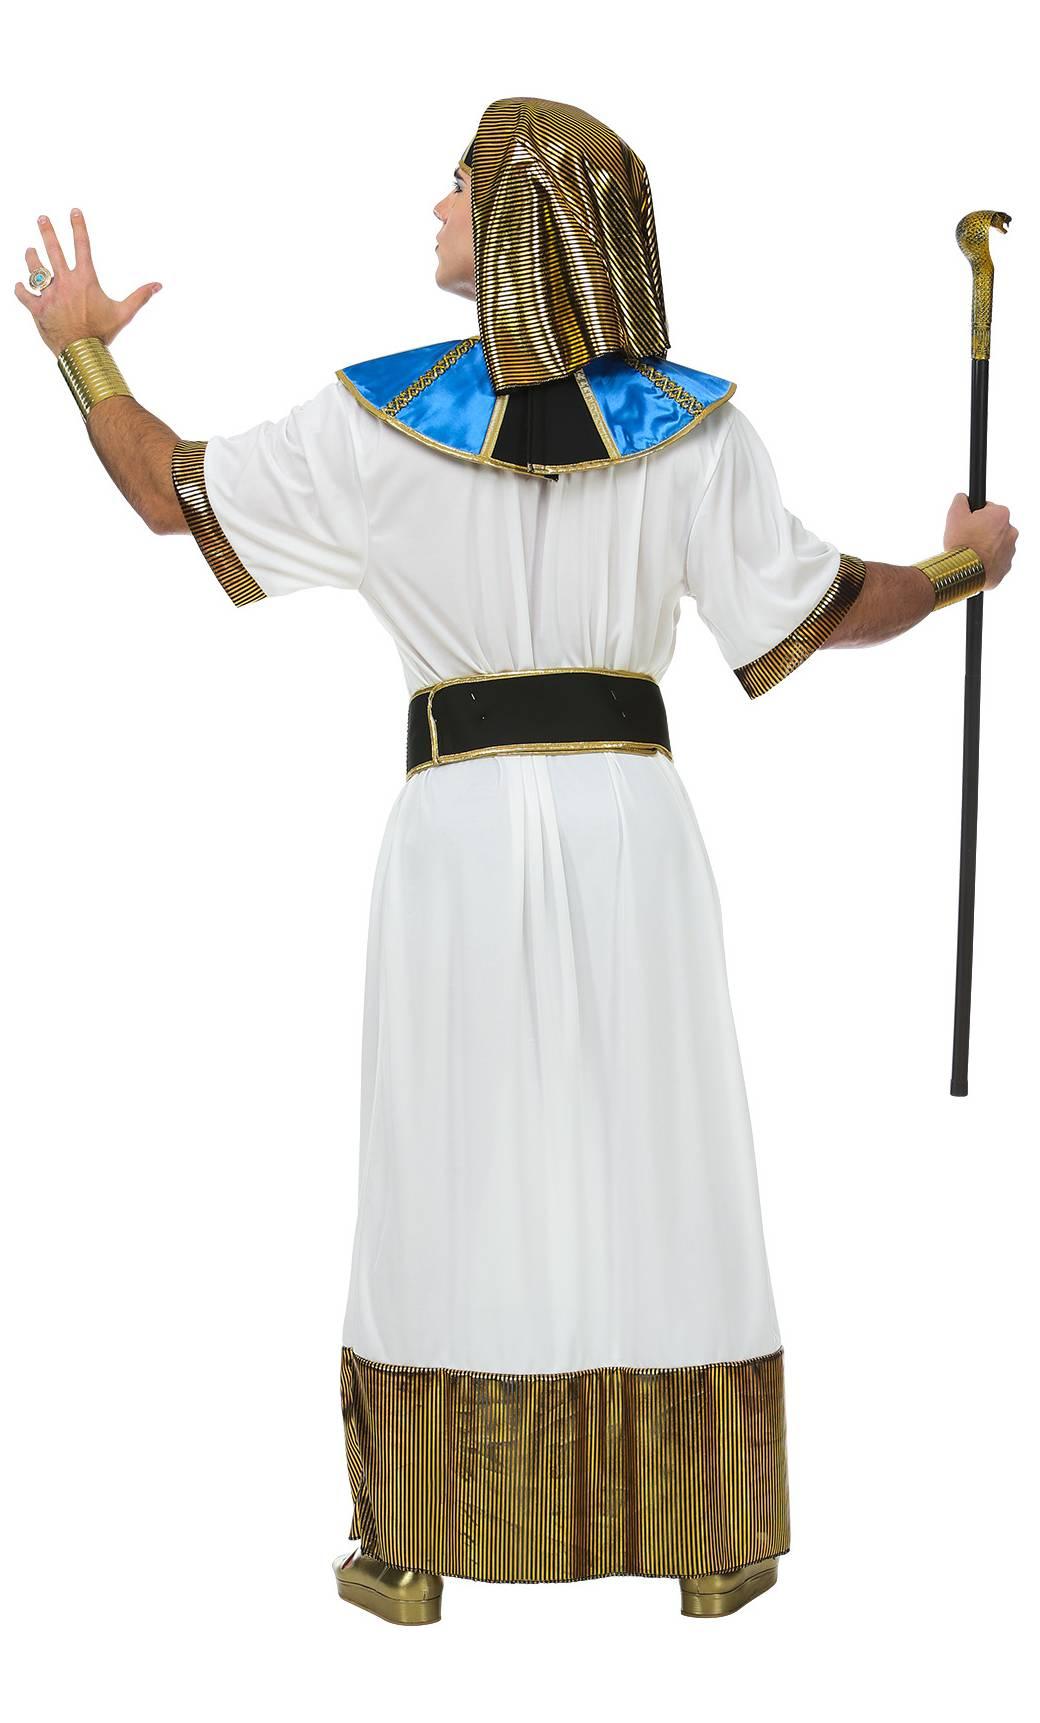 Costume-Pharaon-Egyptien-XL-2